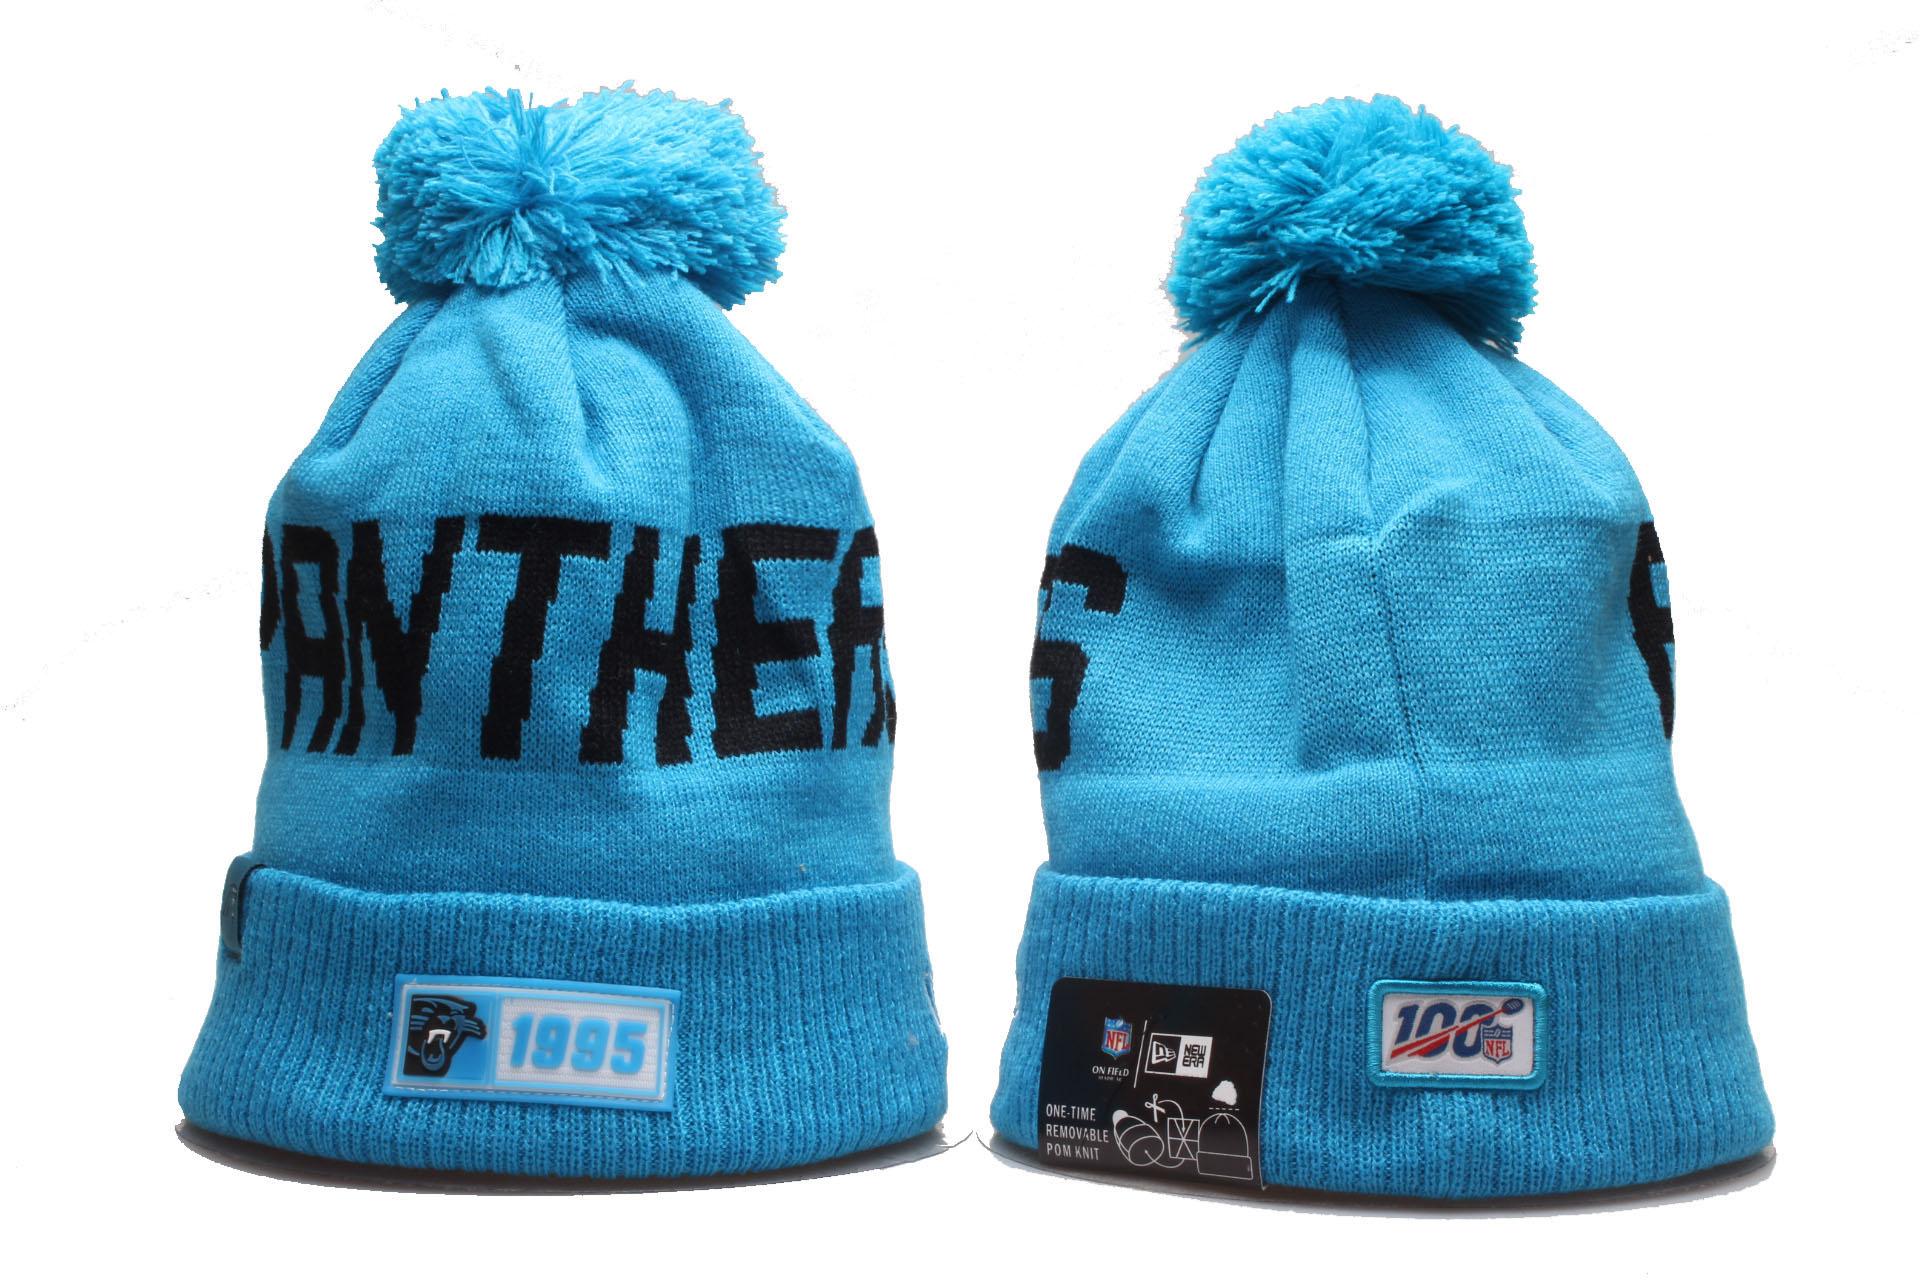 Panthers Team Logo Blue 100th Season Cuffed Pom Knit Hat YP